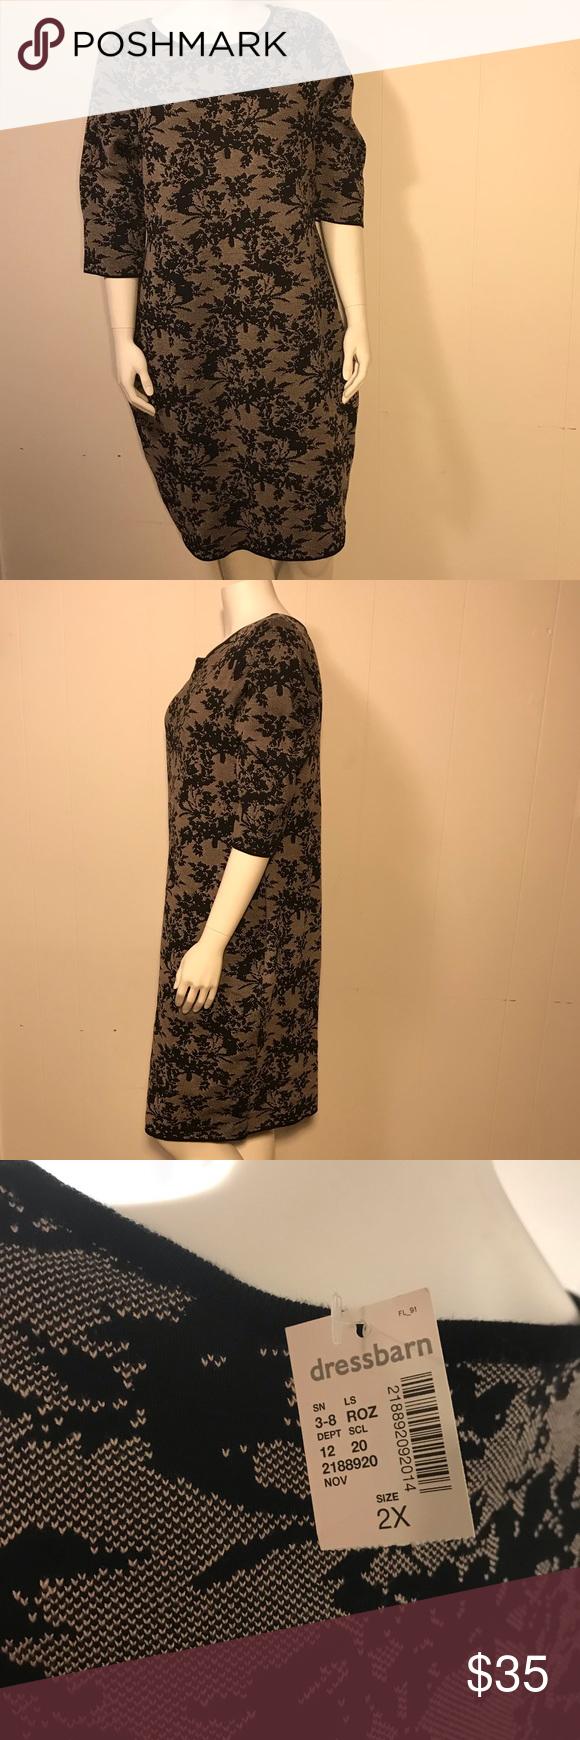 Nwt Roz Ali Long Sleeve Dress 2x Beautiful Faux Lace Dress Long Sleeve Poly Rayon Blend Tan Black Lacy Floral Pattern Si Dresses 2x Clothes Design Roz Ali [ 1740 x 580 Pixel ]